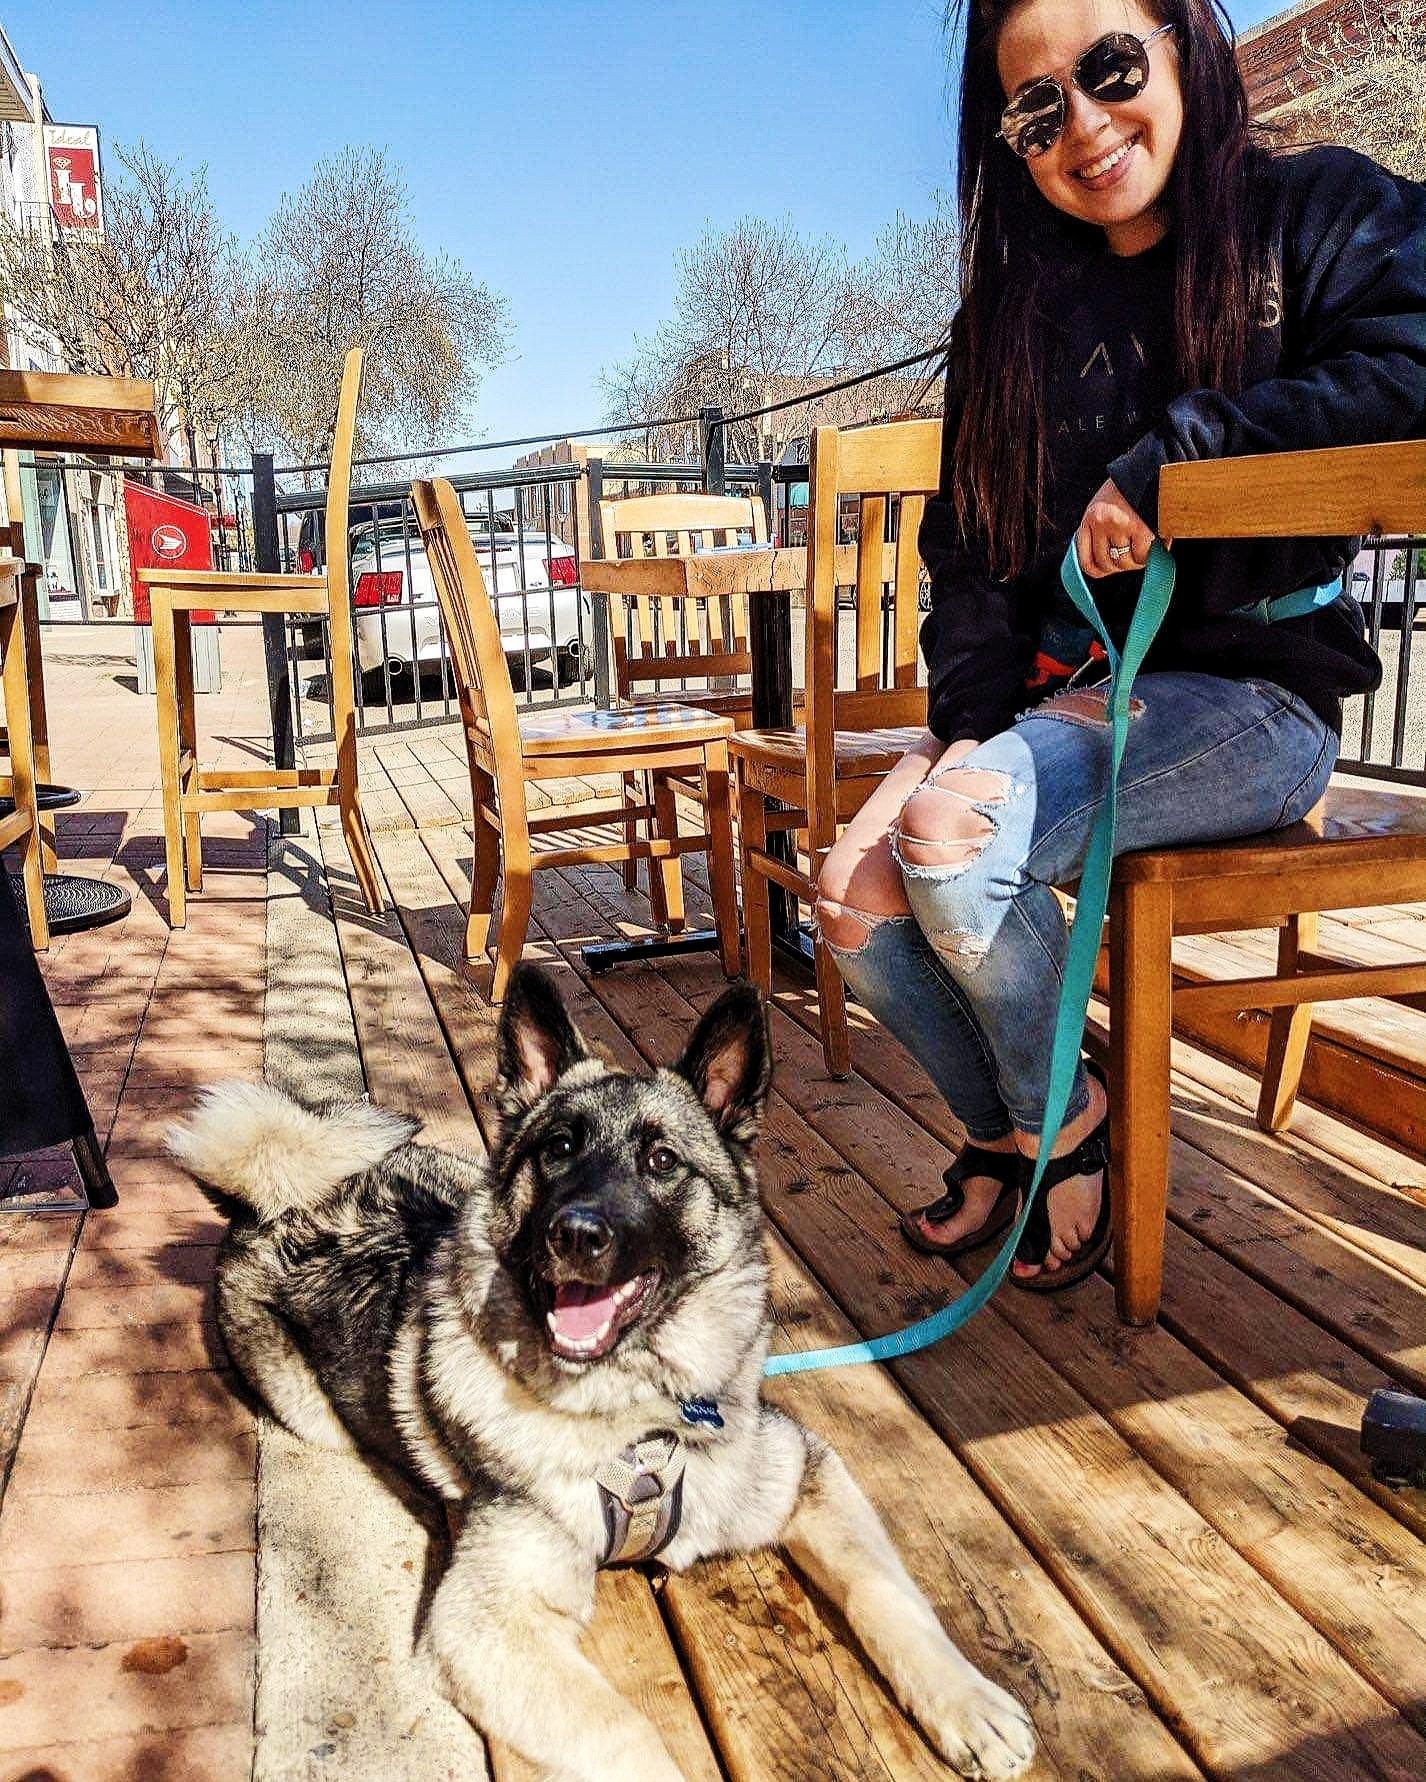 Dog Friendly Patio at Travois